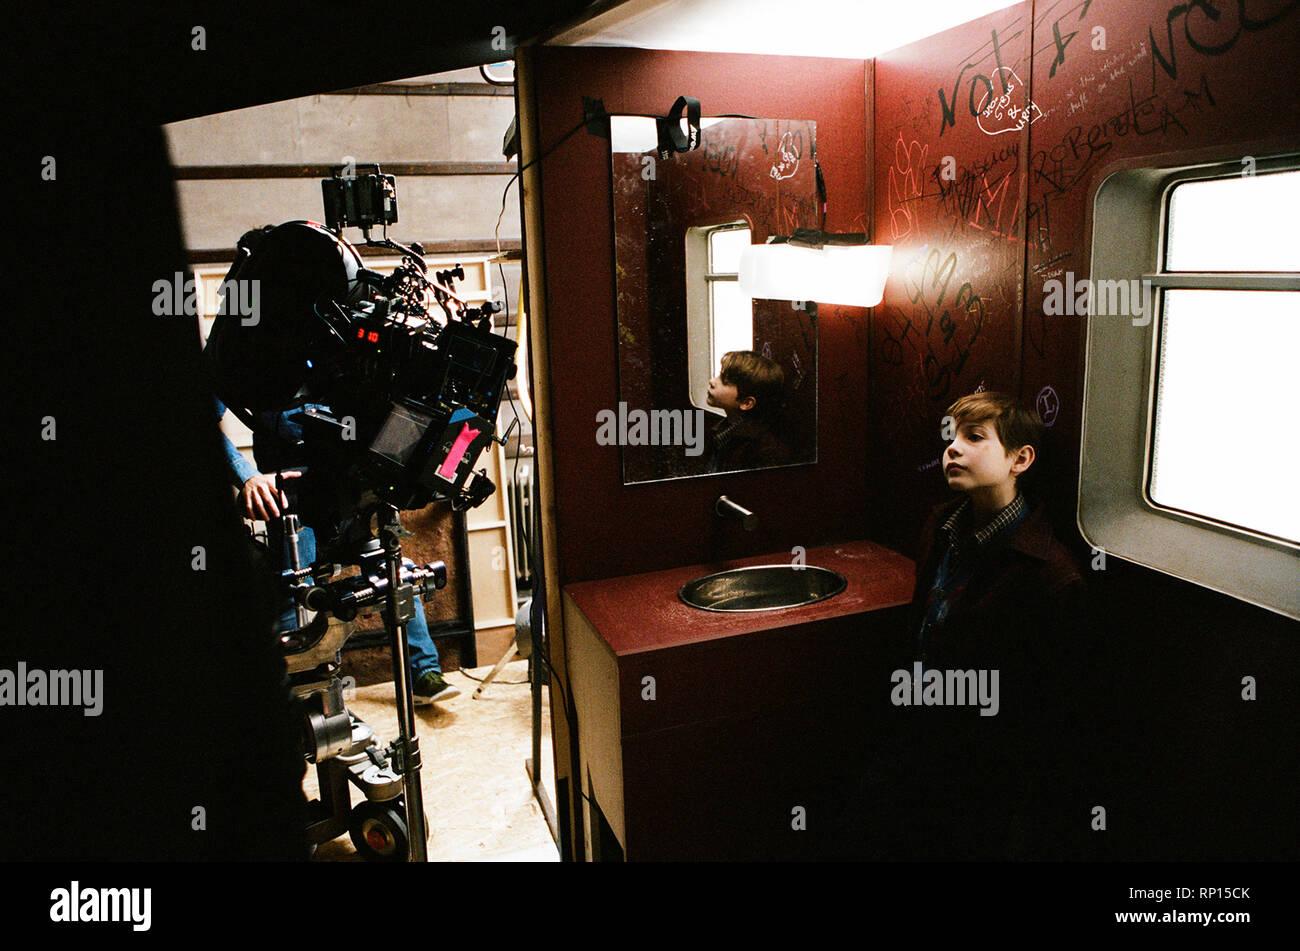 Prod DB © Shayne Laverdiere - Lyla Films - Sons of Manual - Warp Films / DR MA VIE AVEC JOHN F. DONOVAN THE DEATH AND LIFE OF JOHN F. DONOVAN de Xavie - Stock Image